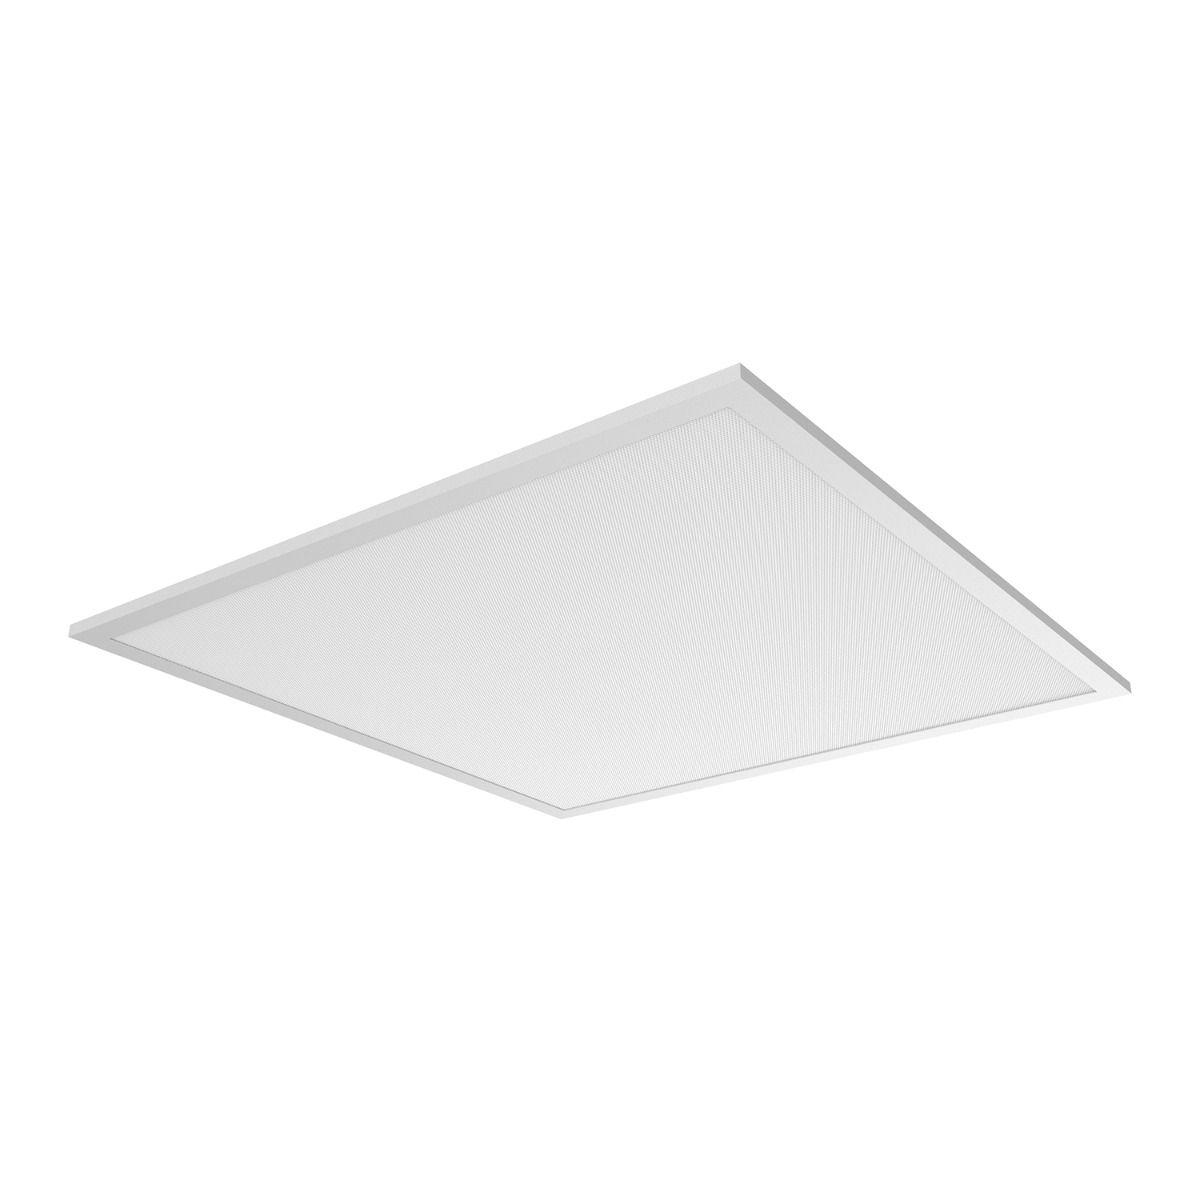 Noxion Panel LED Delta Pro V3 Highlum DALI 36W 4000K 5500lm 60x60cm UGR <19   Blanco Frio - Reemplazo 4x18W